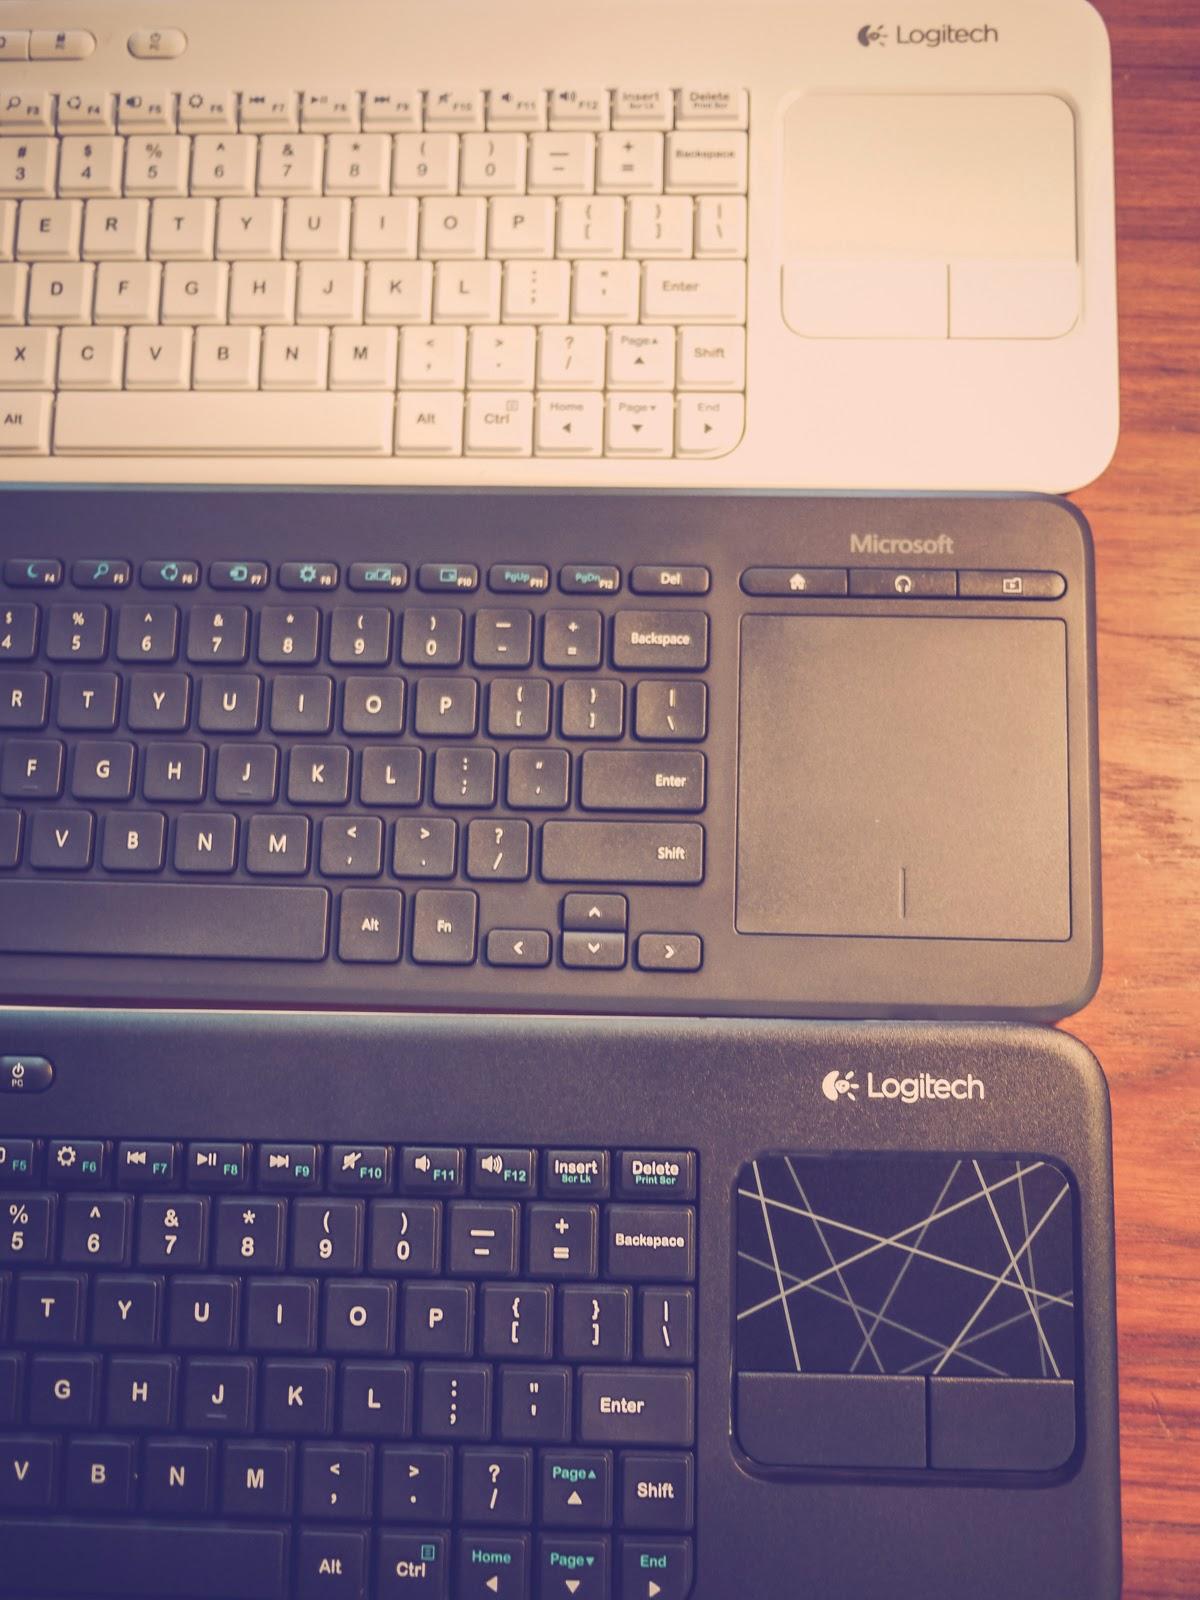 Fortysomething Geek: Microsoft All-in-One Media Keyboard vs